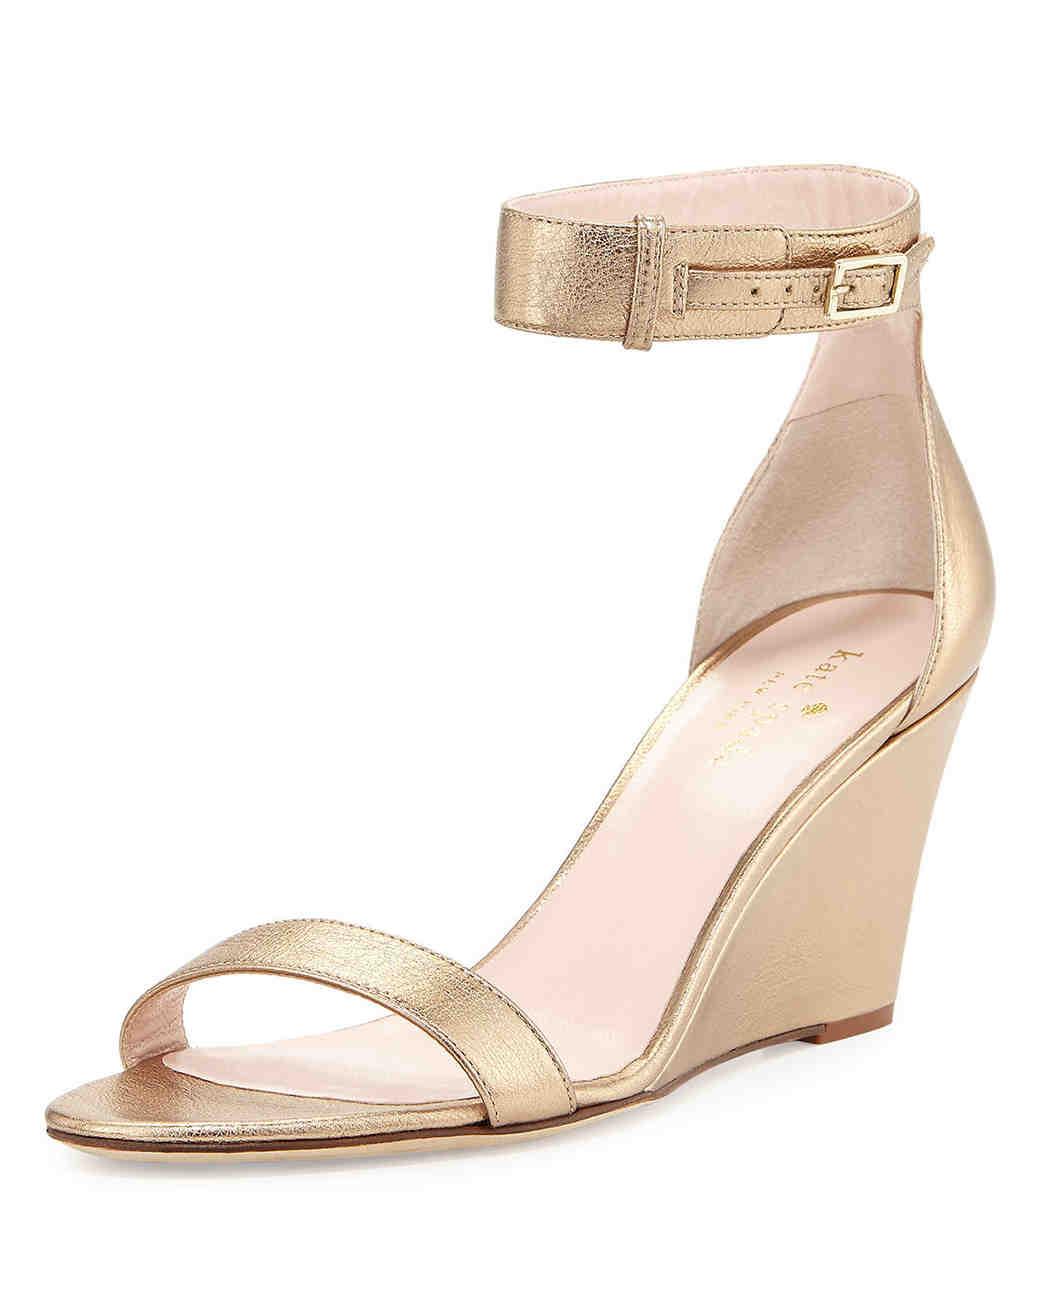 Kate Spade New York Ronia naked wedge sandal